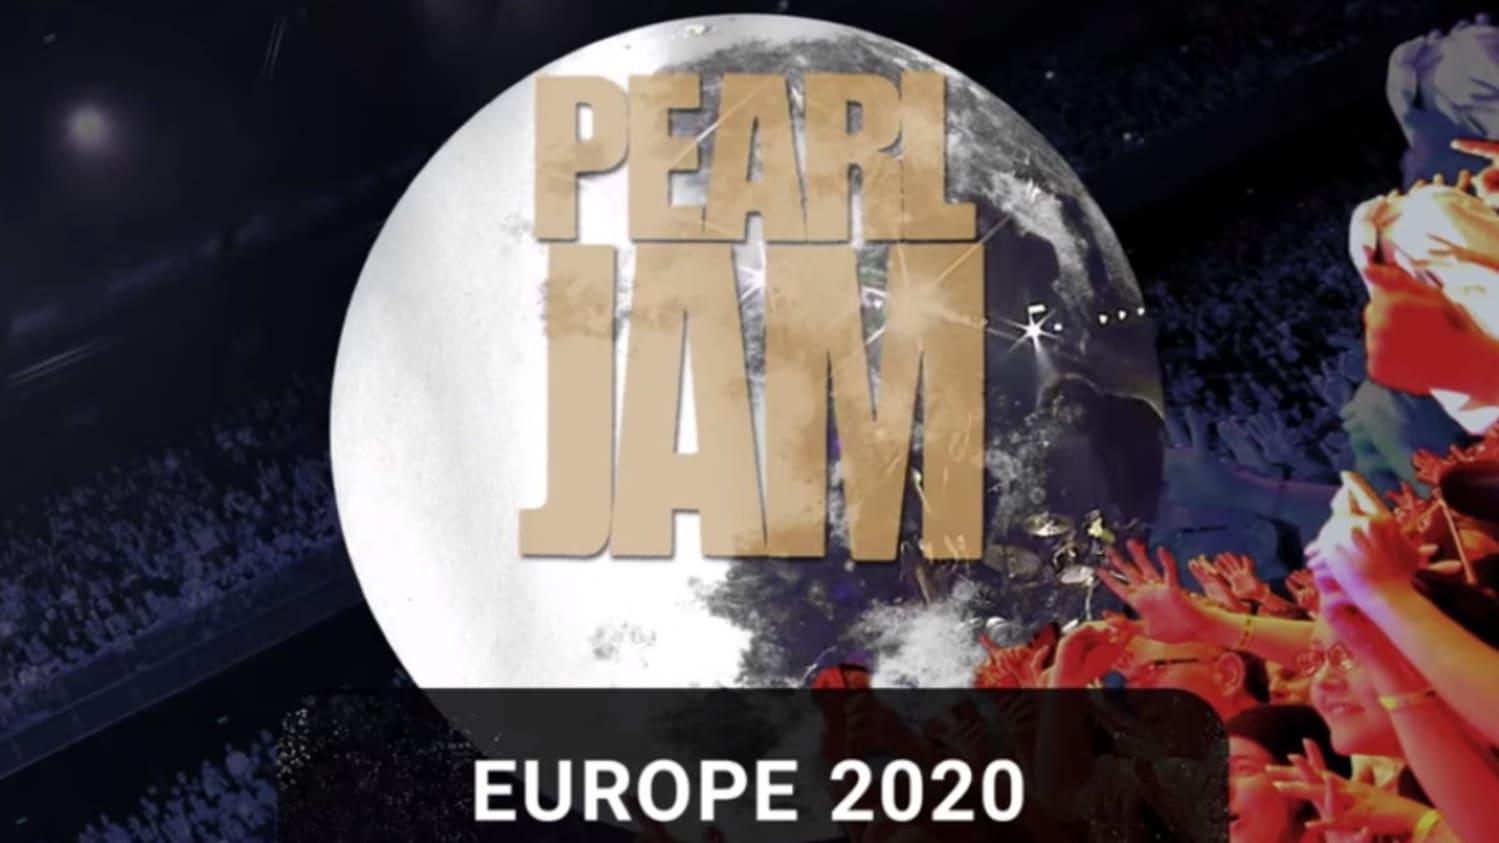 Pearl Jam 2020 Tour.Pearl Jam Announces Summer Tour 2020